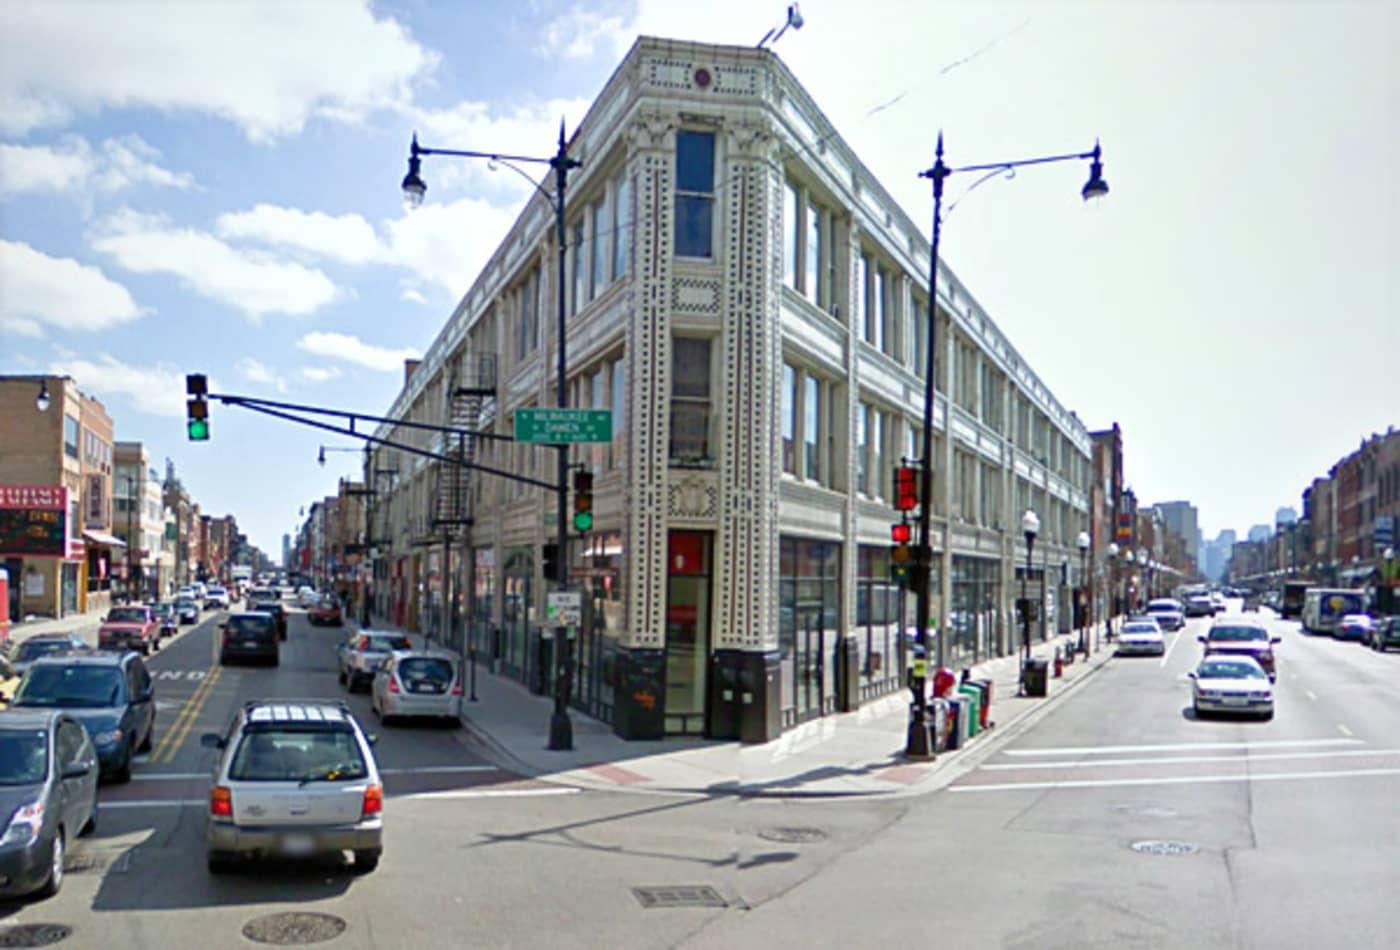 Wicker-Park-Chicago-Best-Kept-Secret-Neighborhoods-CNBC.jpg